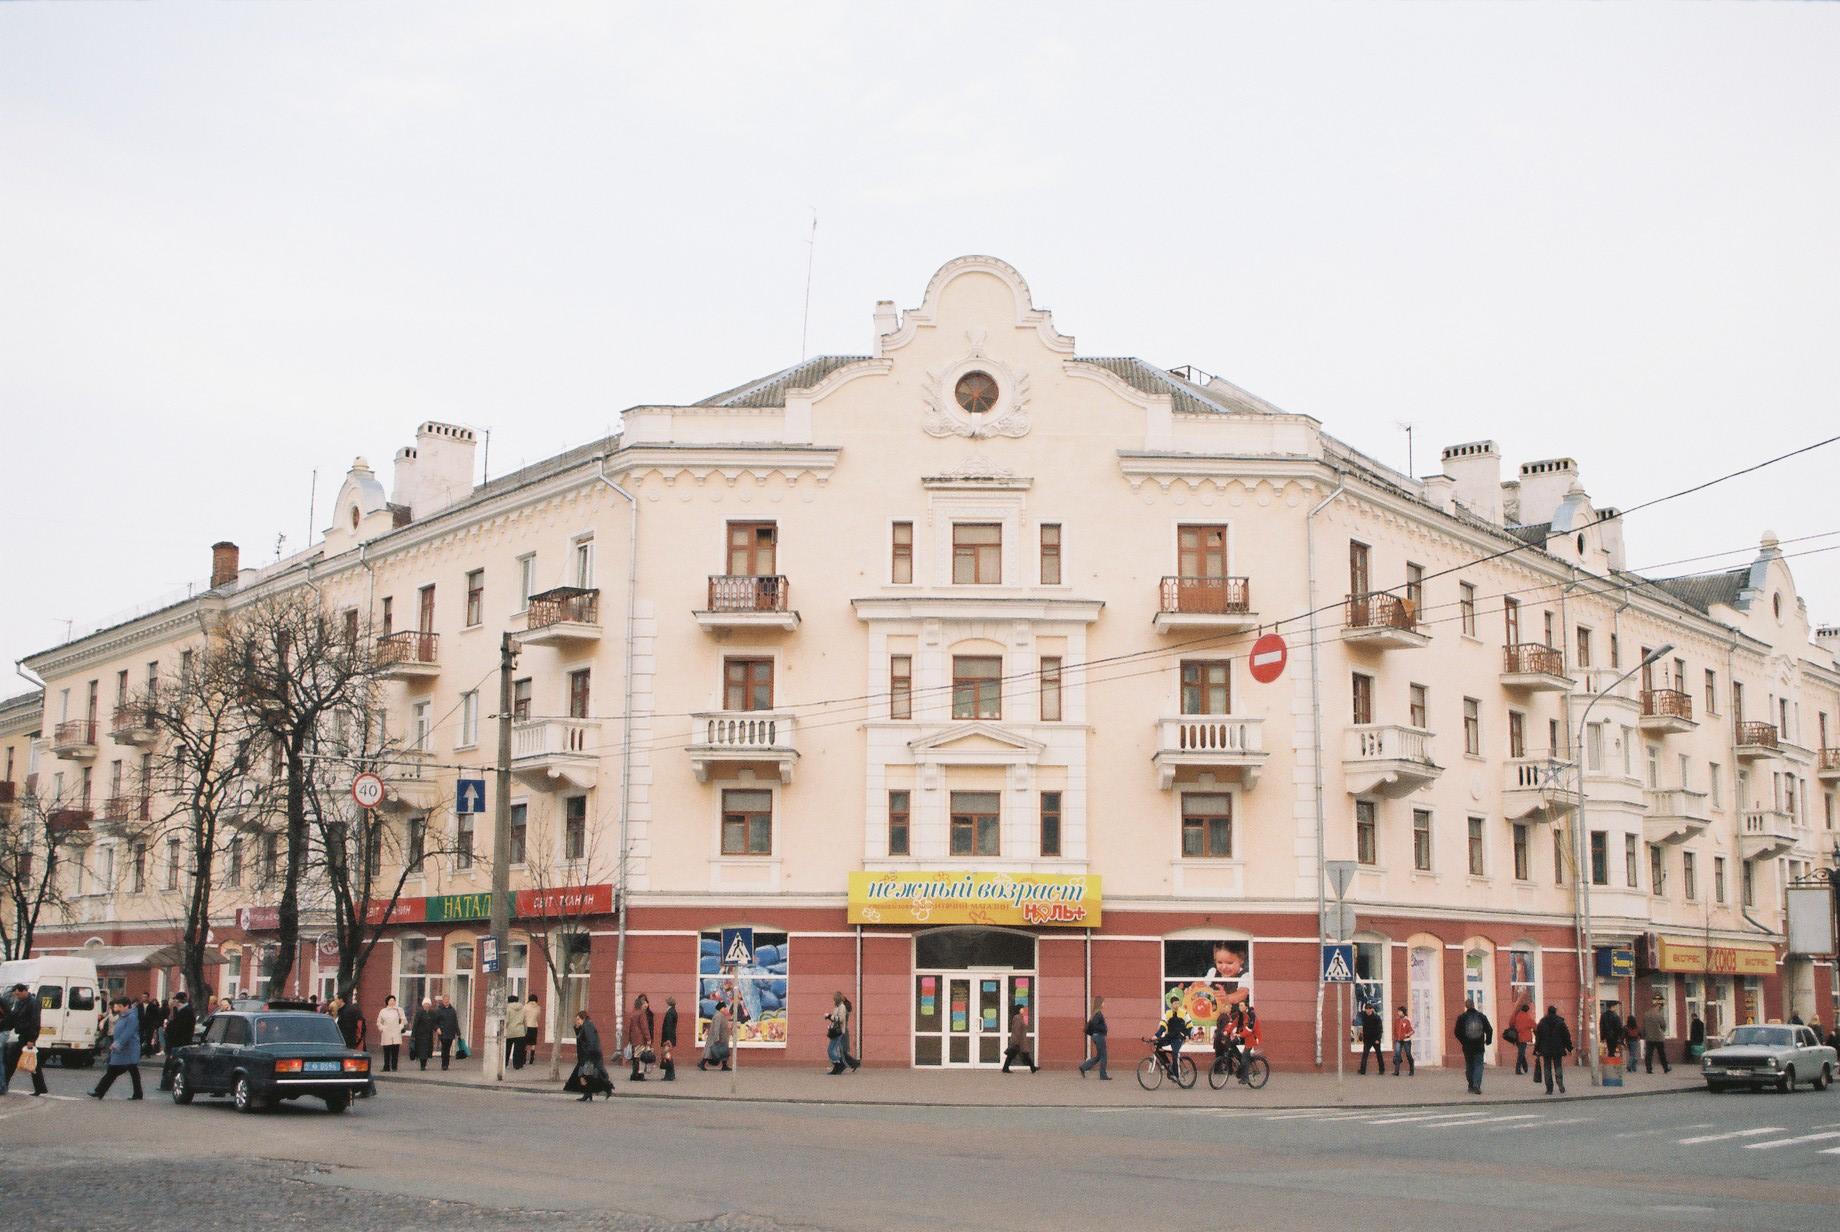 Chernihiv Ukraine  City pictures : Chernihiv ukraine